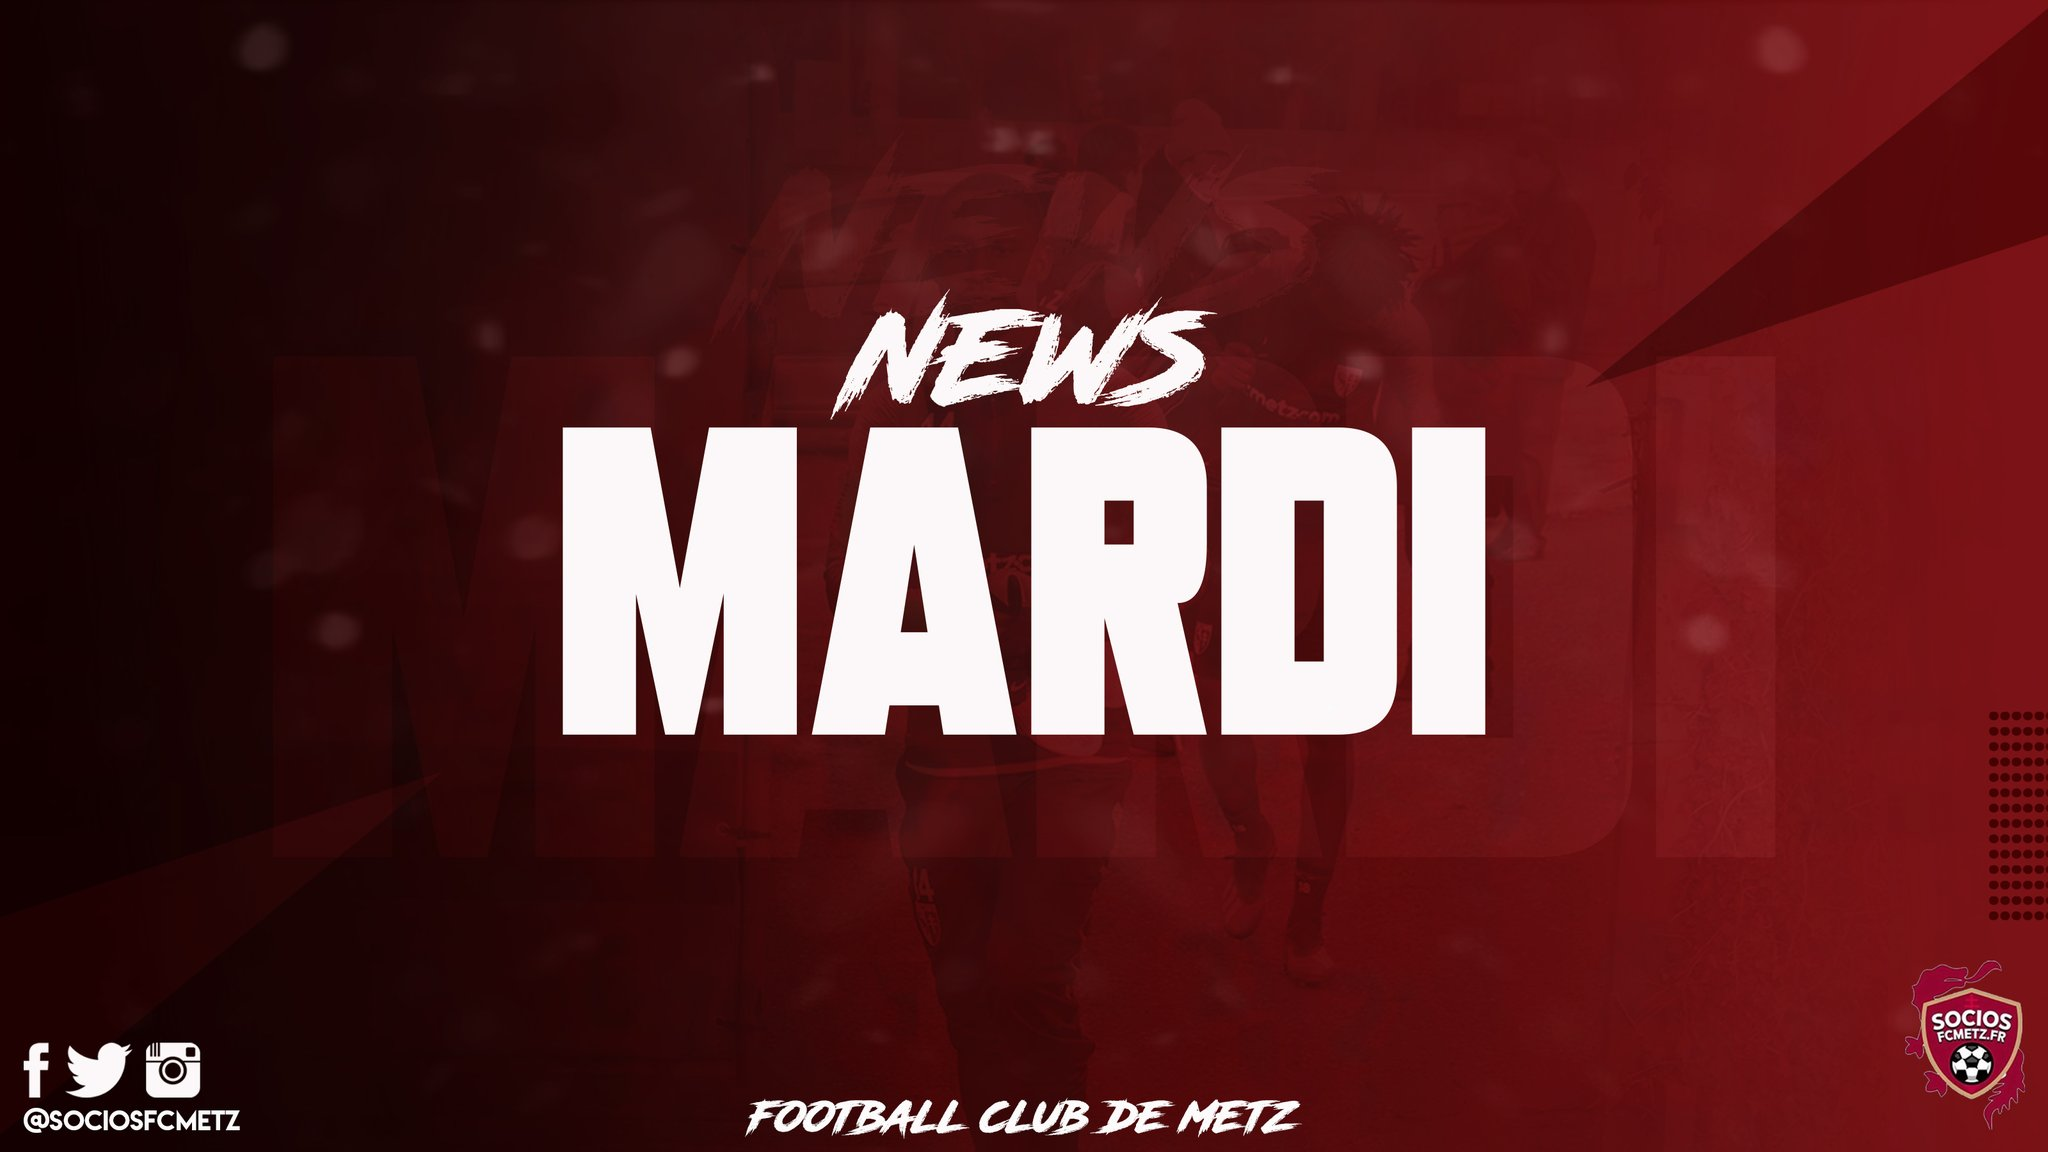 news mardi